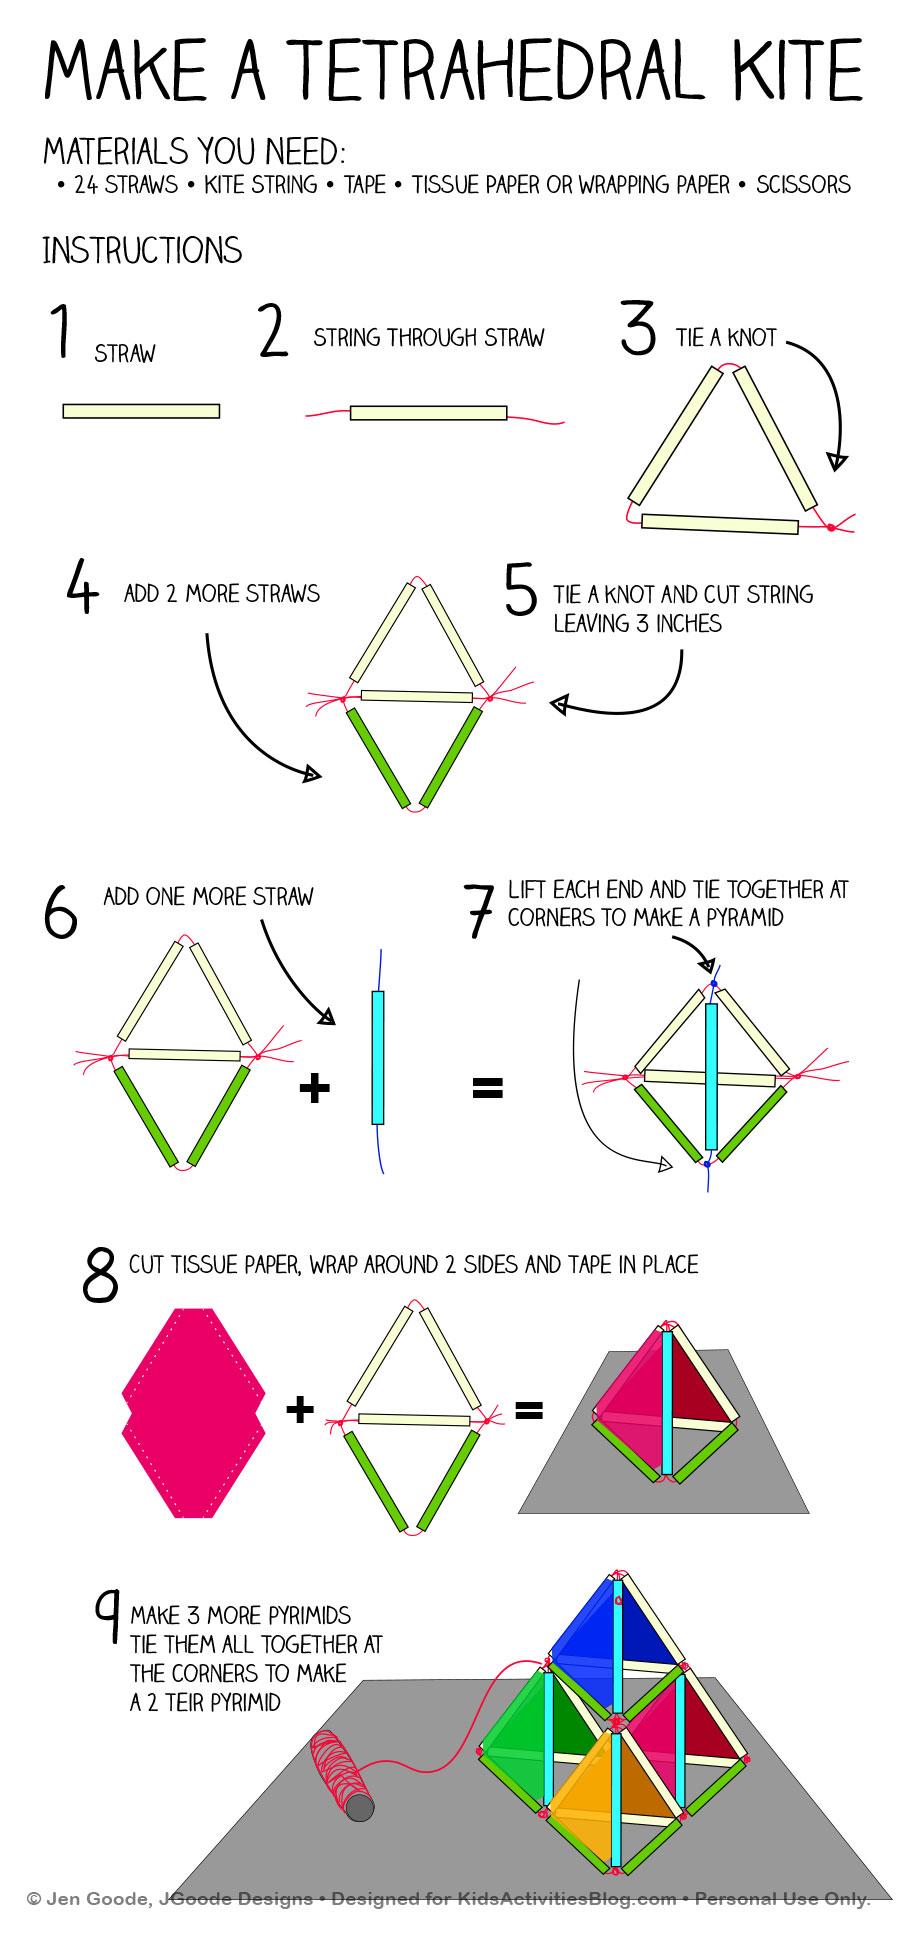 Make a Tetrahedral Kite Printable